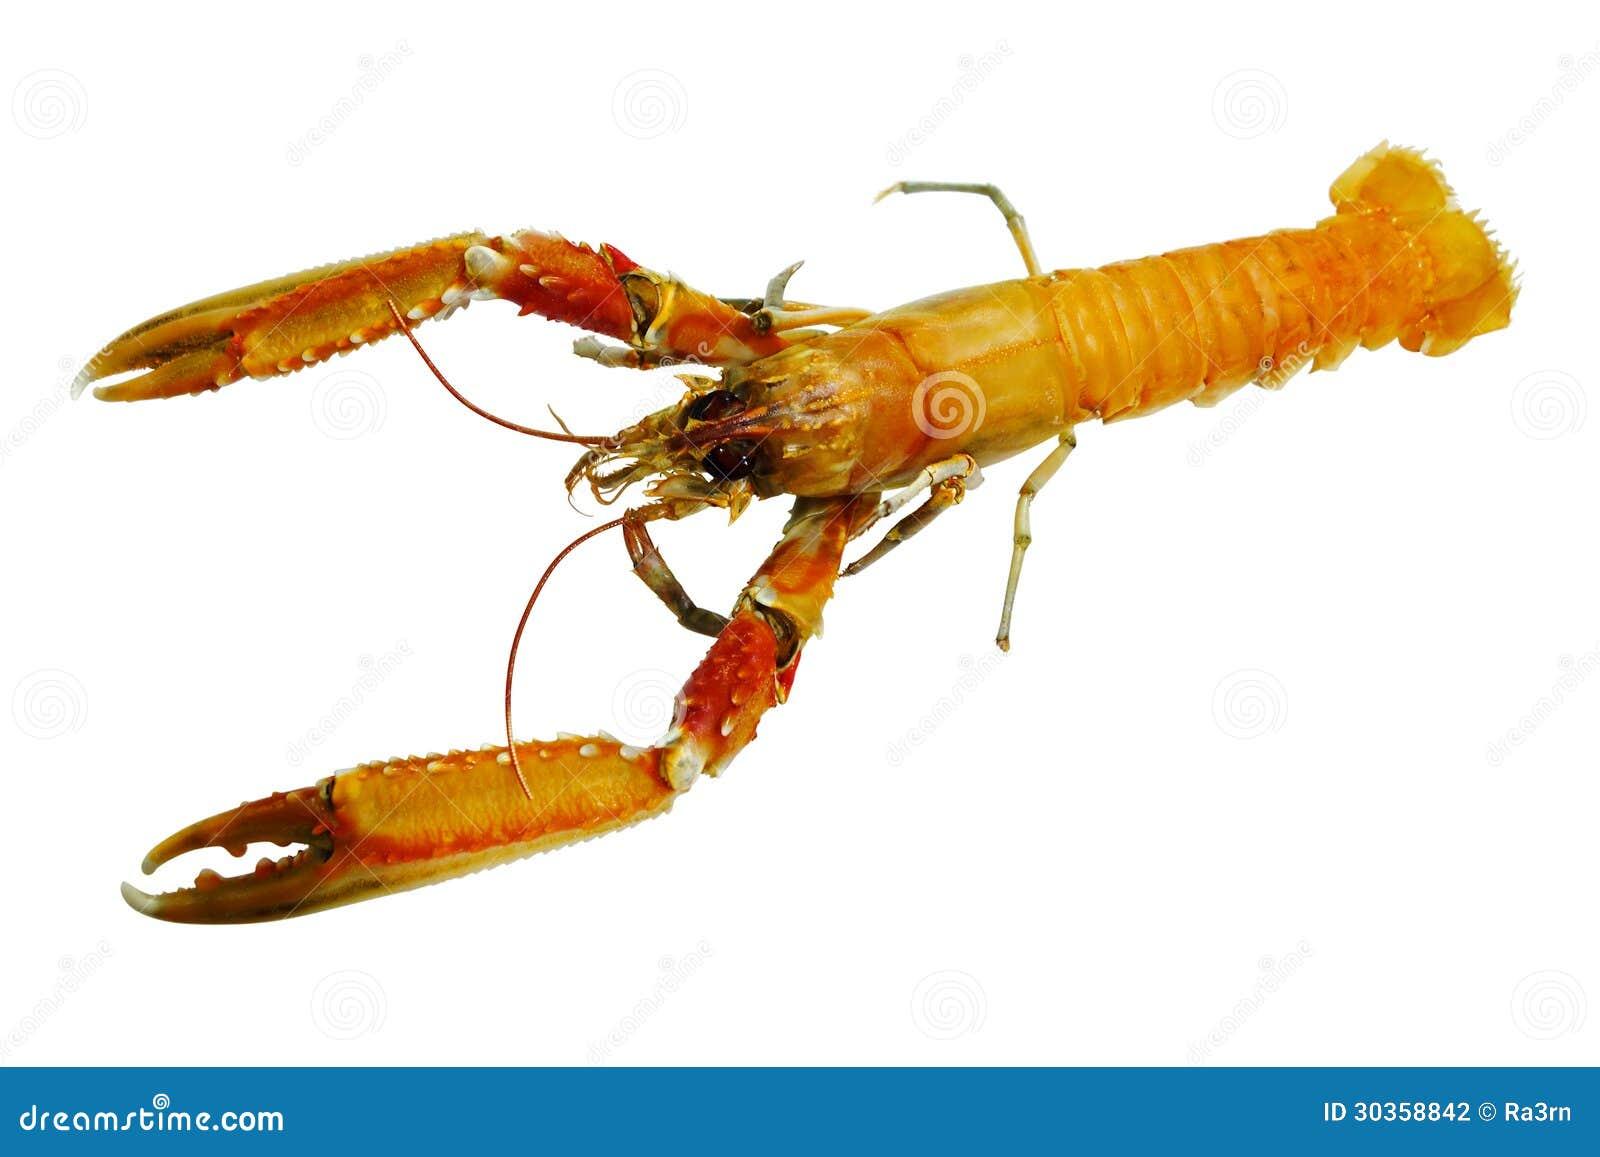 shrimp business plan